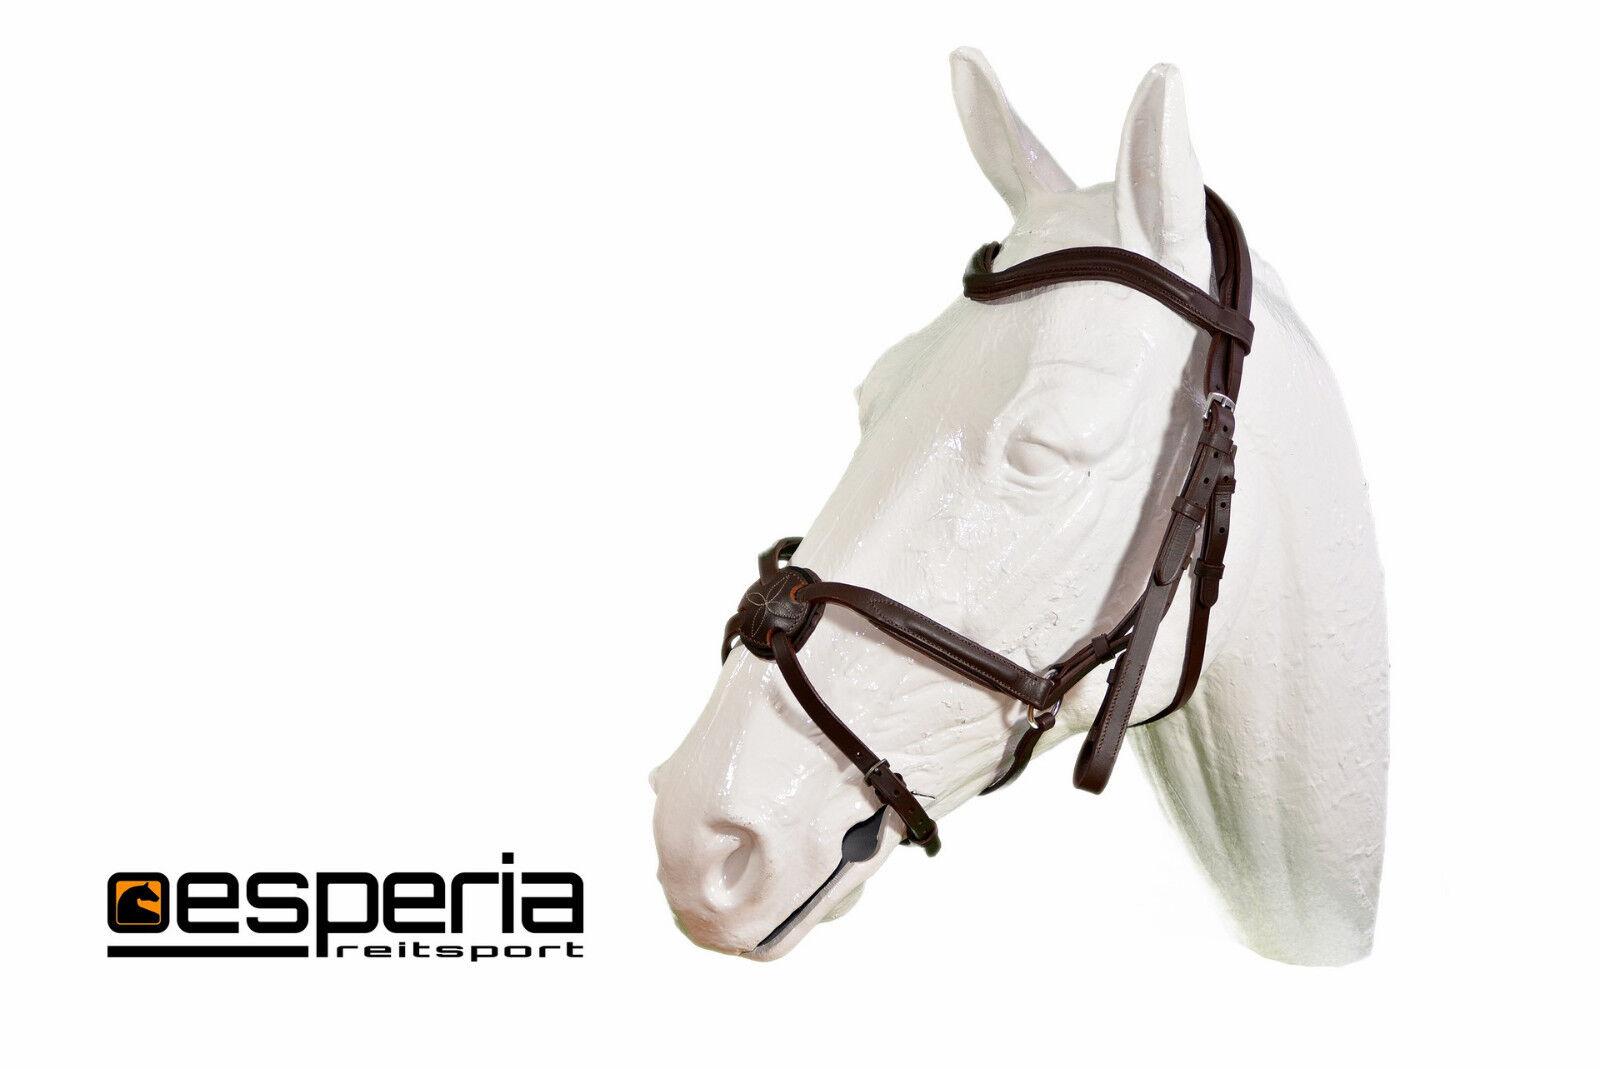 Esperia Mexikanischer Zaum Trense braun / weiß COB/Full/Pony Leder; K25 F112